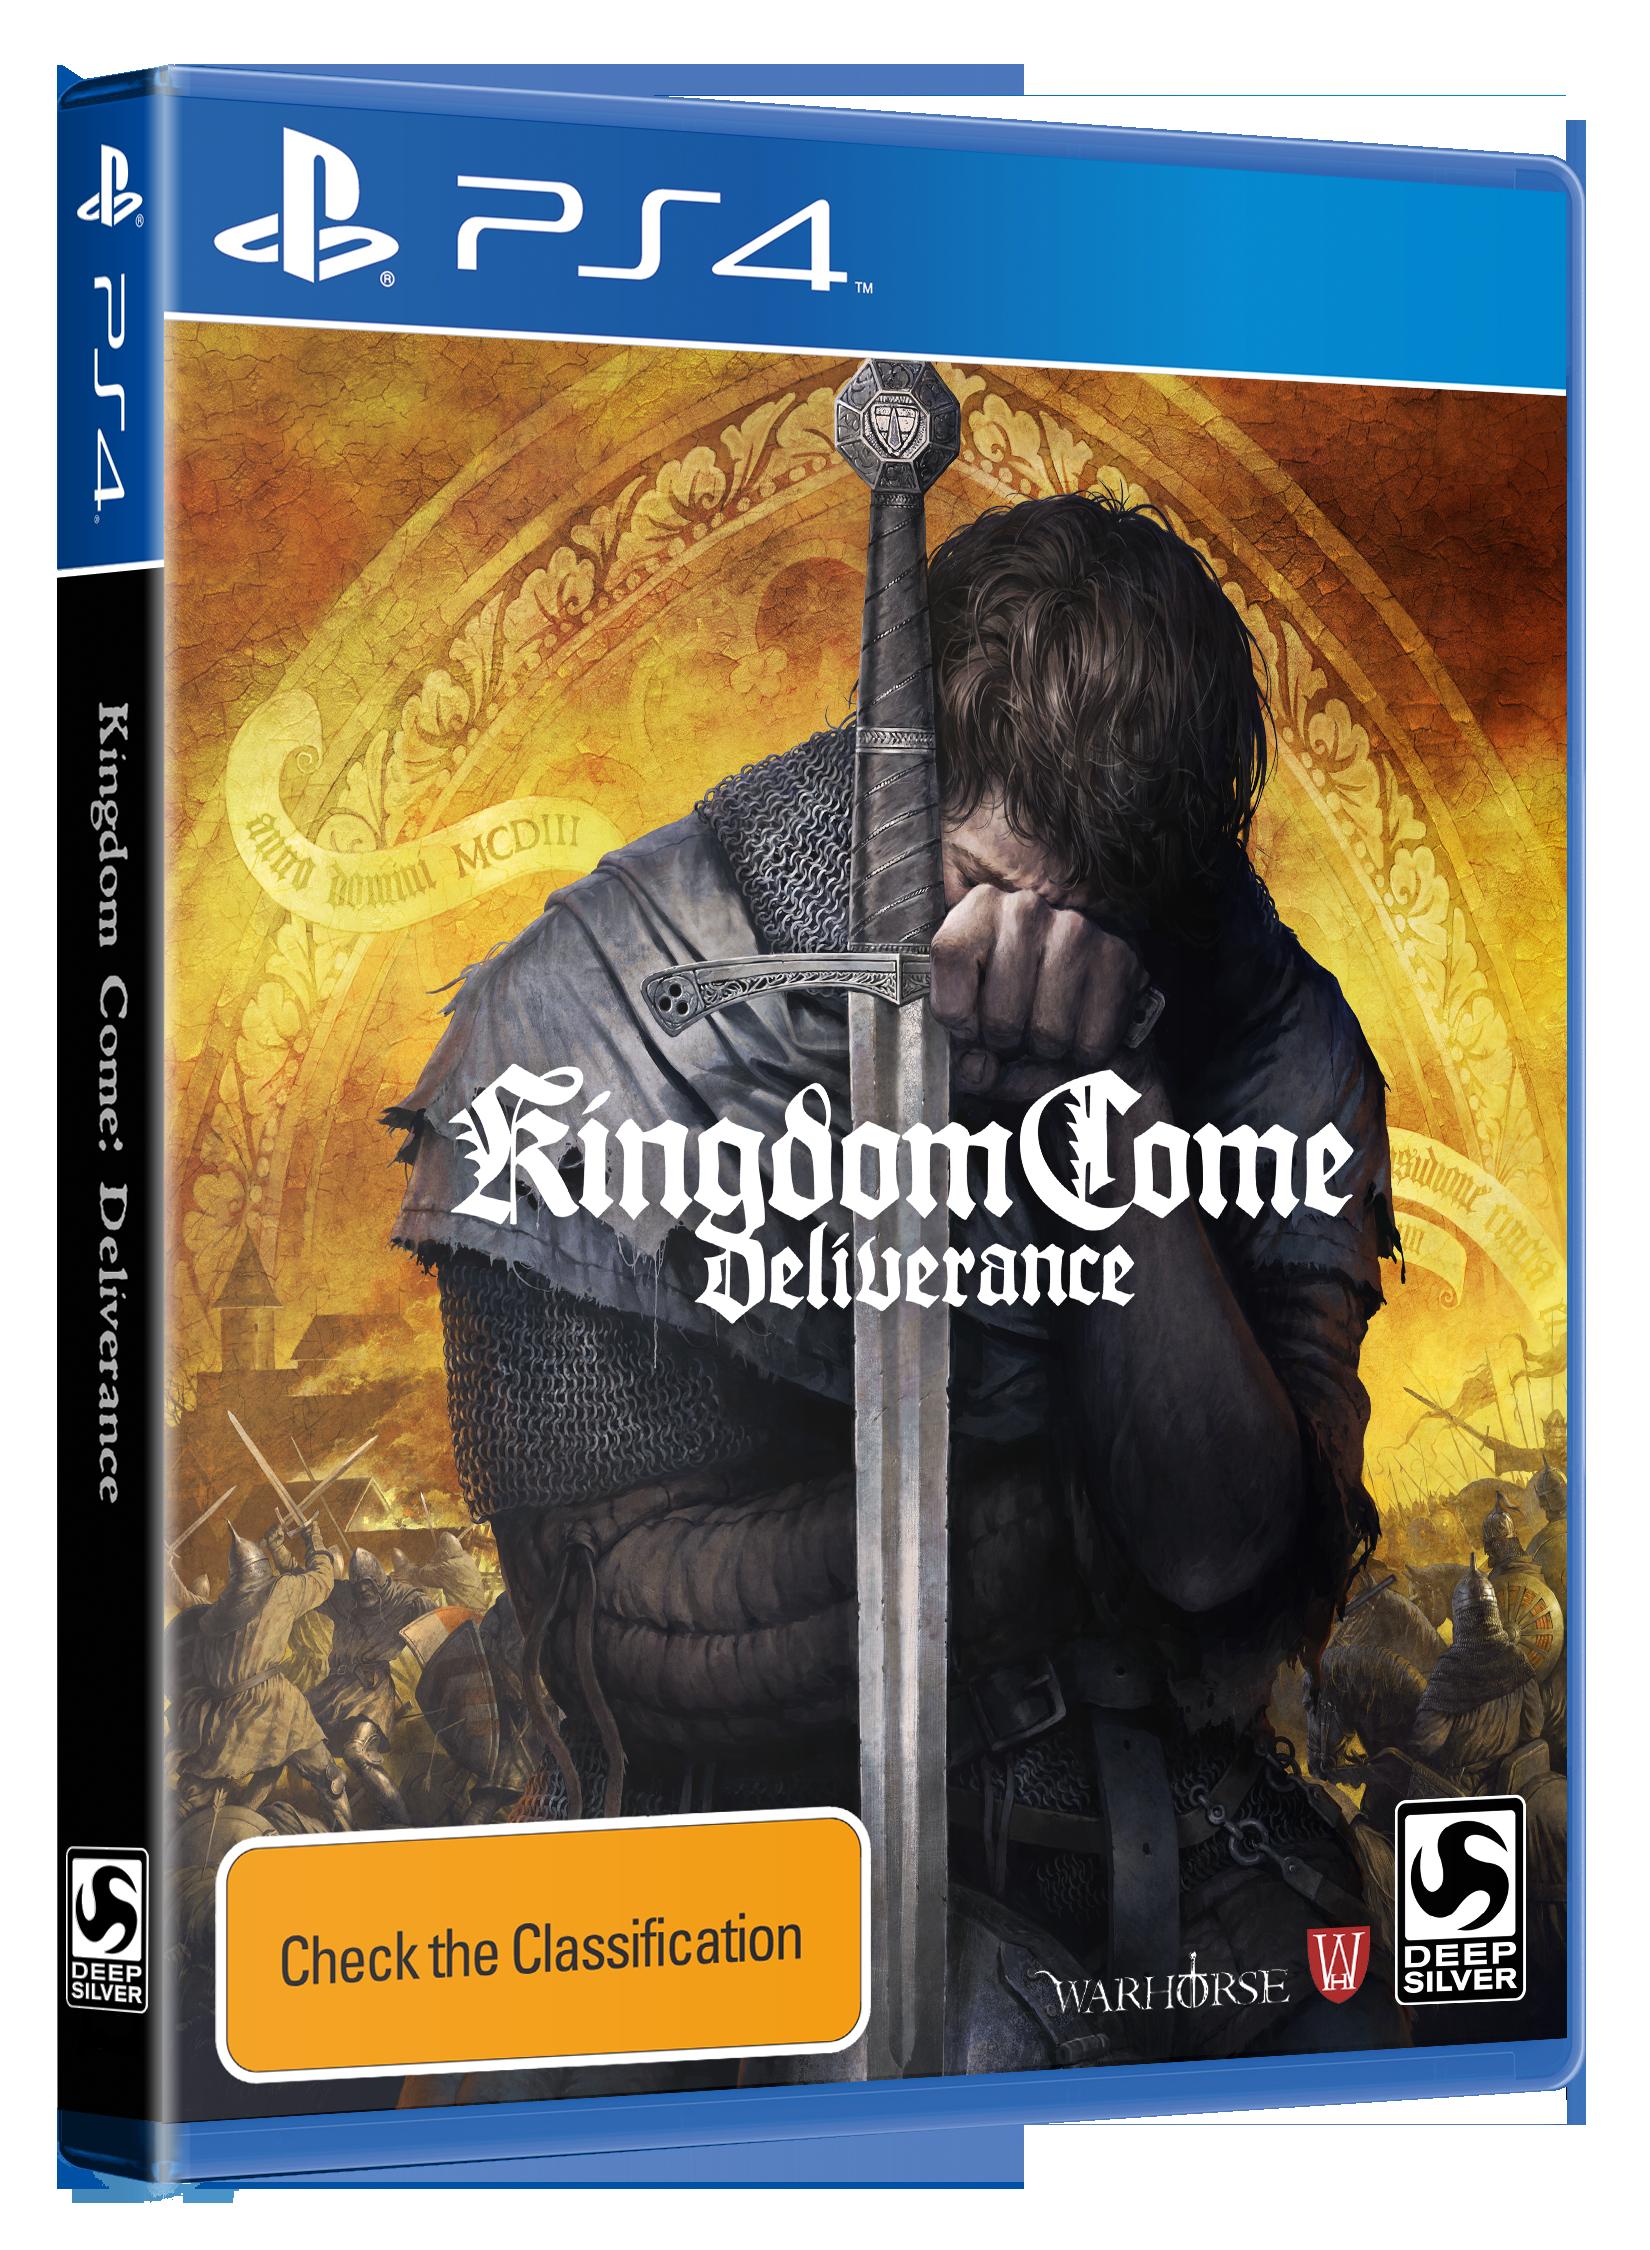 Kingdom Come Deliverance Console Commands list: codes to